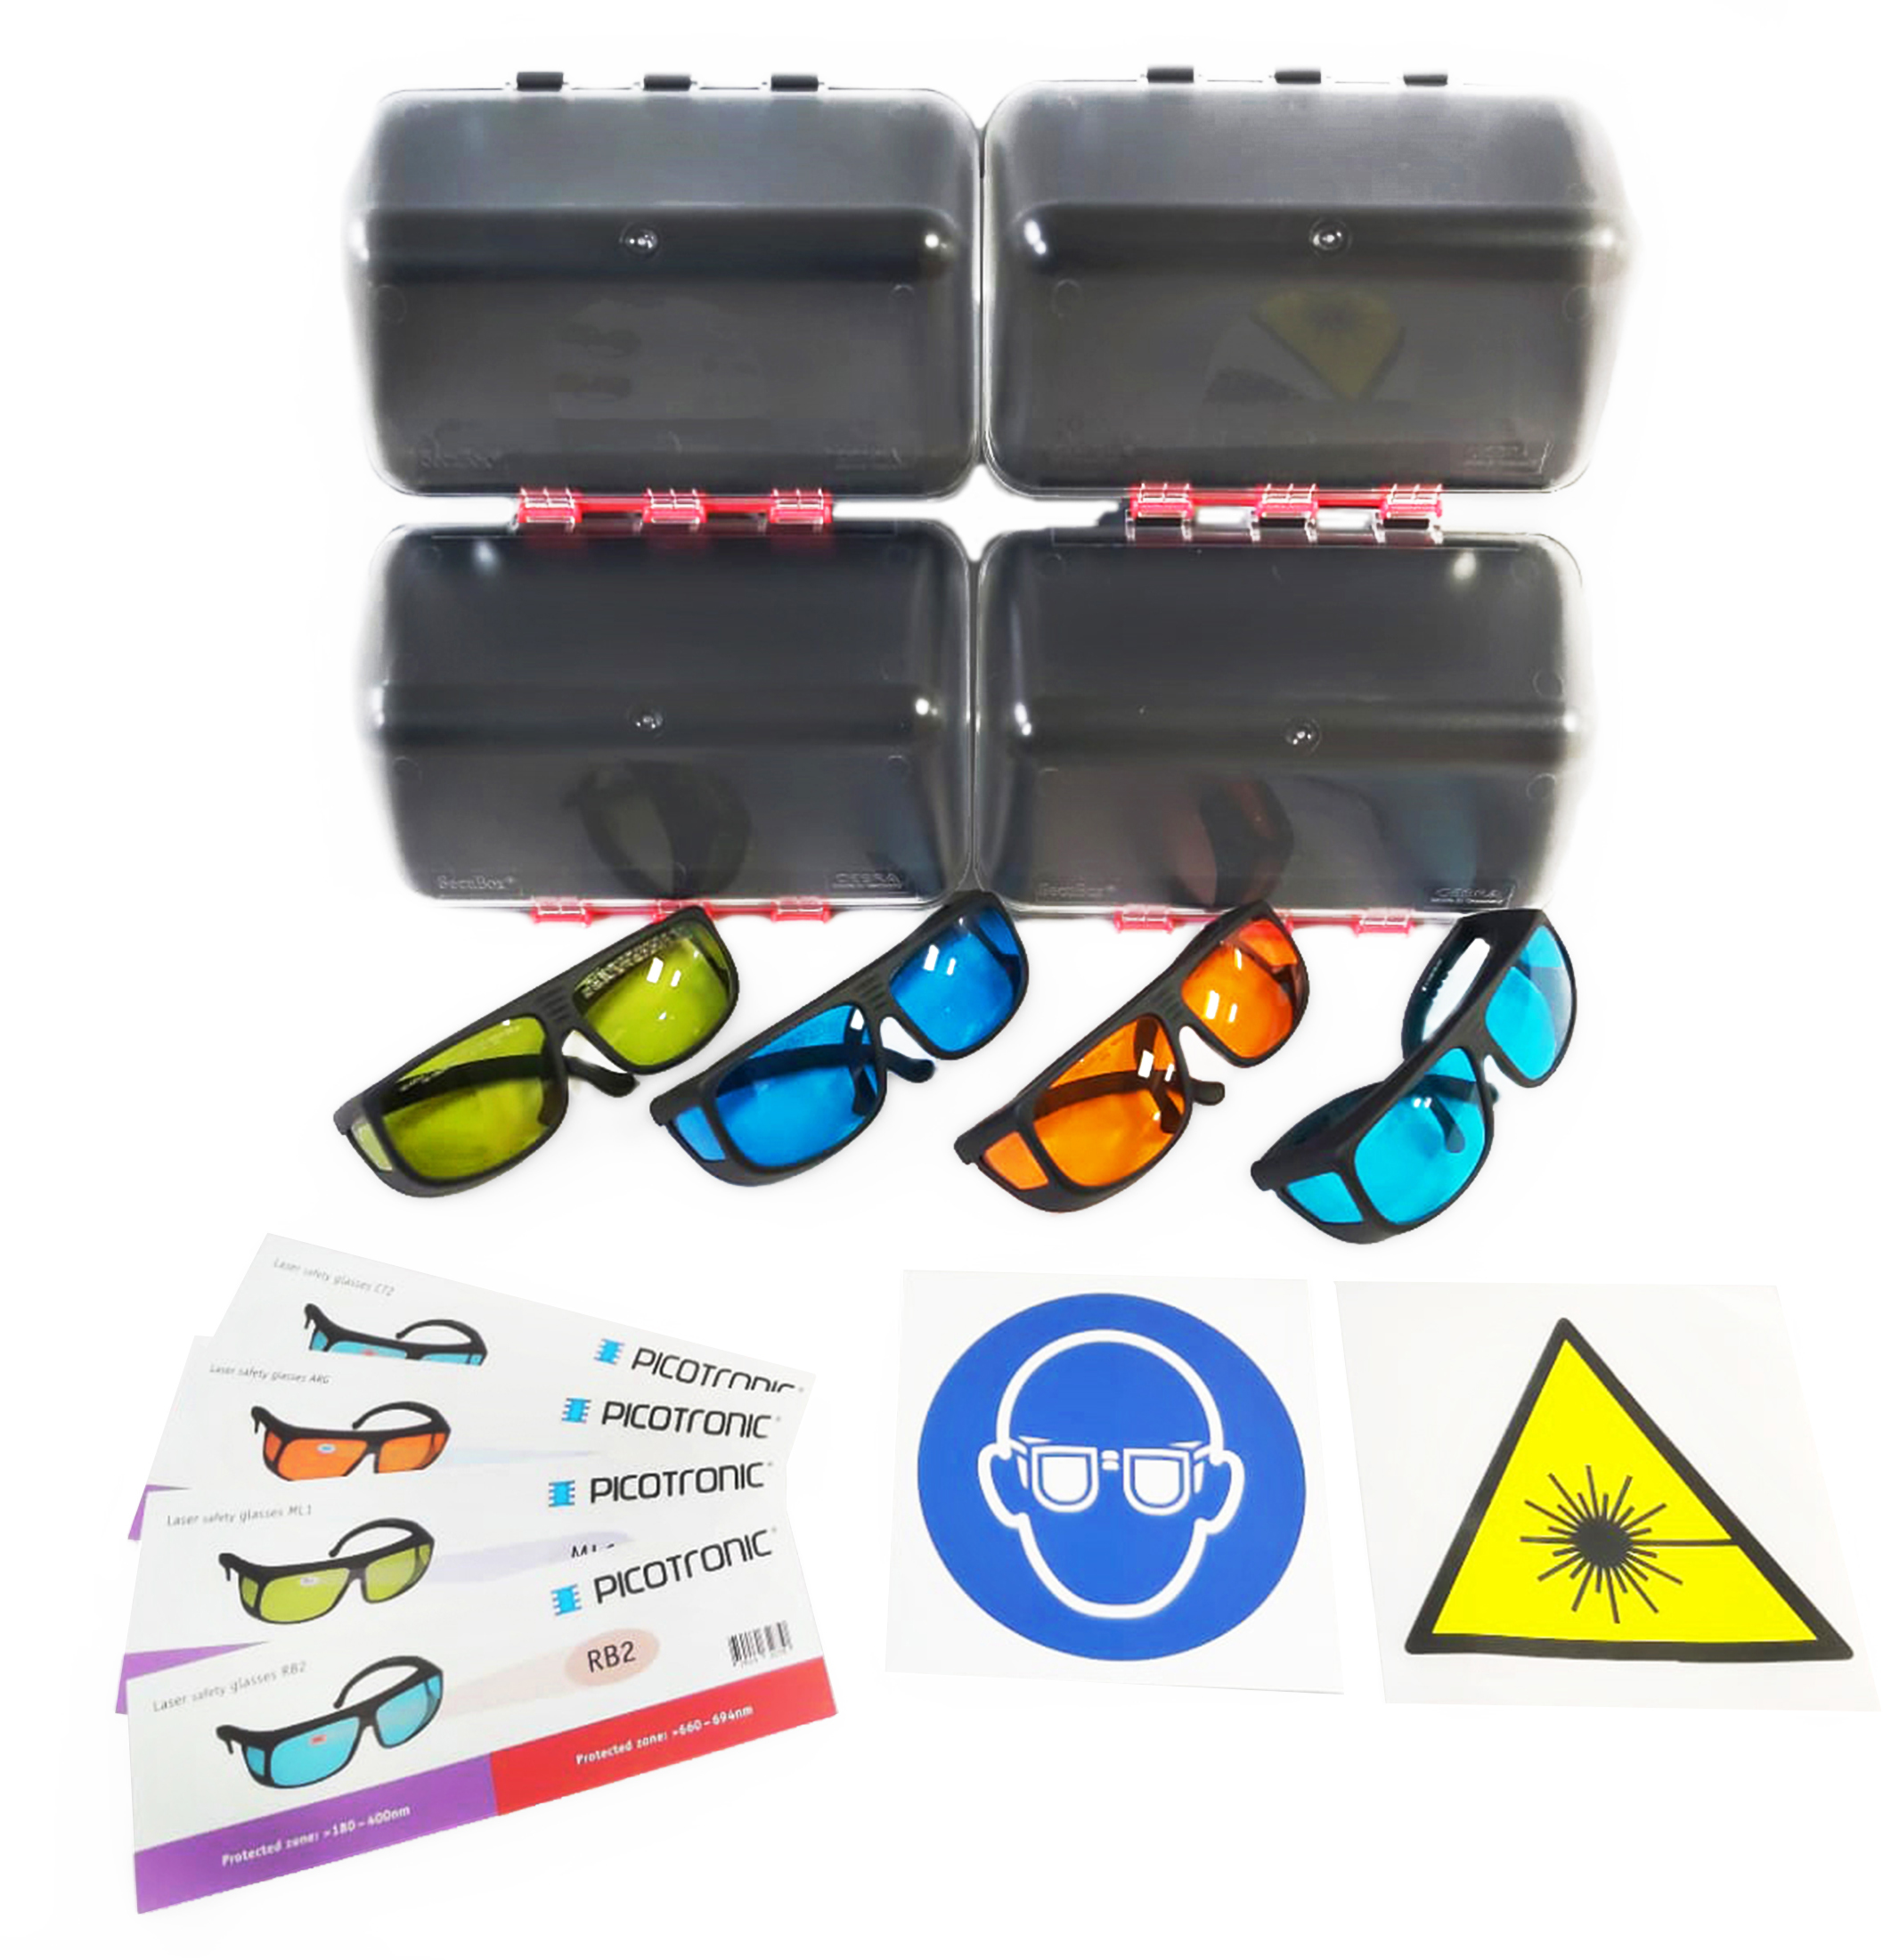 https://media.picotronic.de/products/ds_picture/lightbox/brillen4_retuschiert_neu.jpg